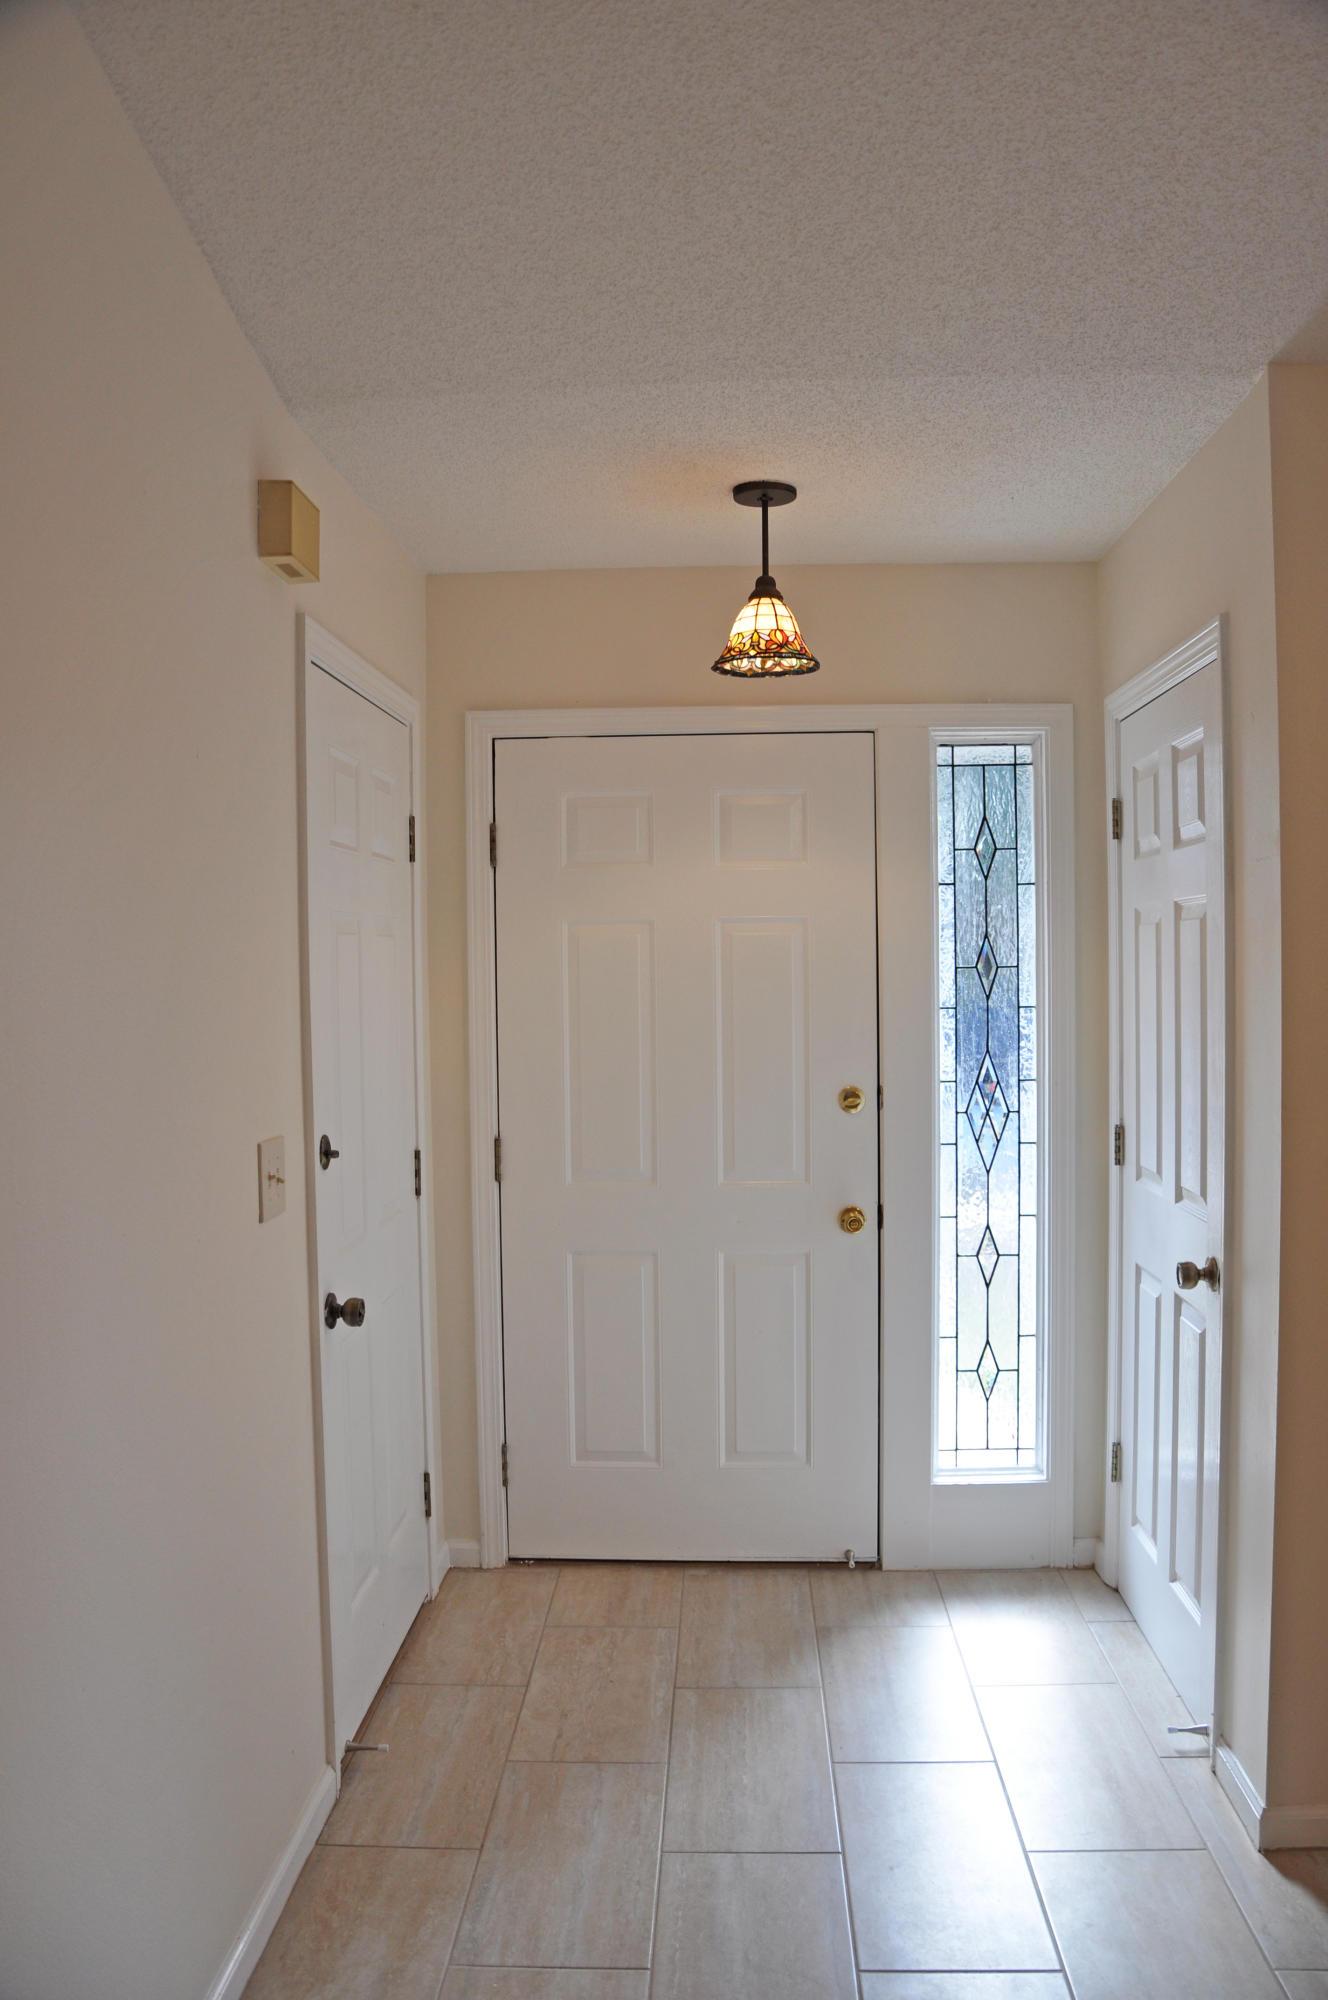 A 2 Bedroom 2 Bedroom Cedar Ridge Ph 9 Home